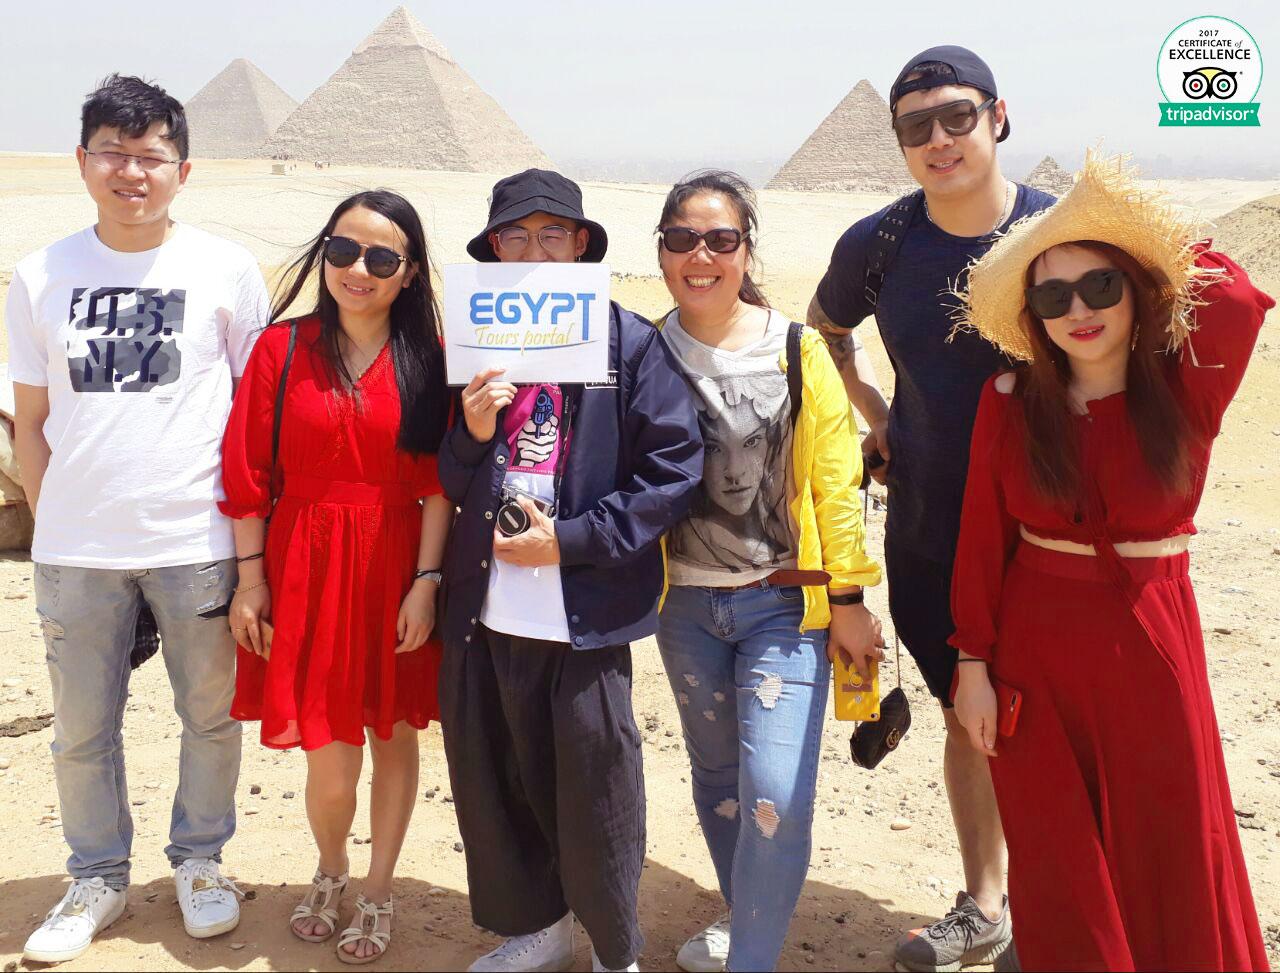 Giza-Pyramids - 5 Days Cairo & Nile Cruise Package - Egypt Tours Portal